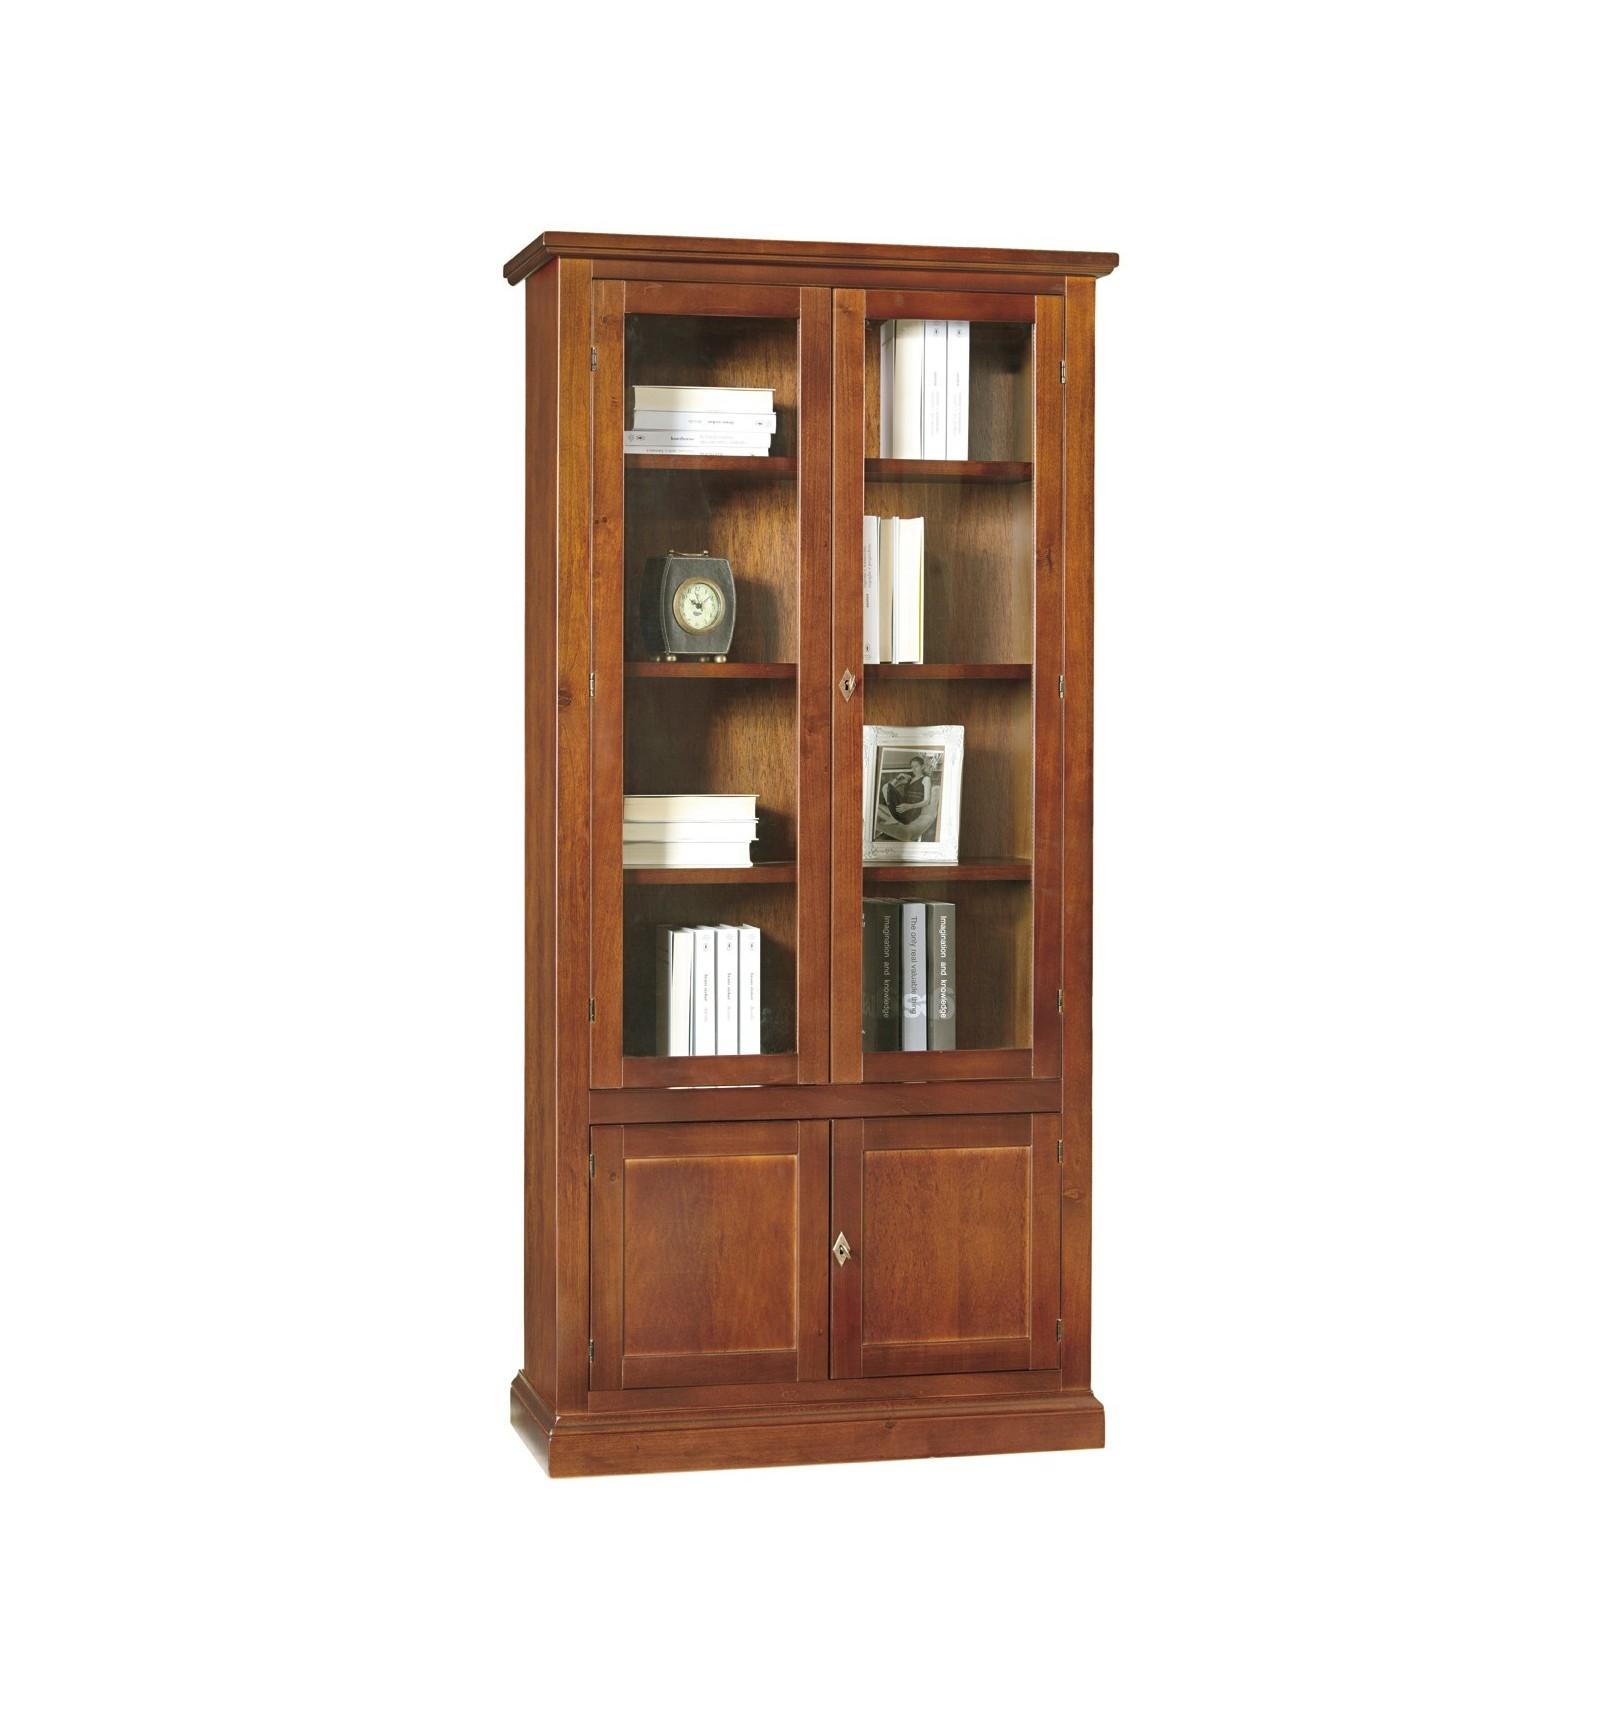 Libreria vetrina arte povera 2 porte vetro 2 ceche tinta for Libreria acciaio e vetro